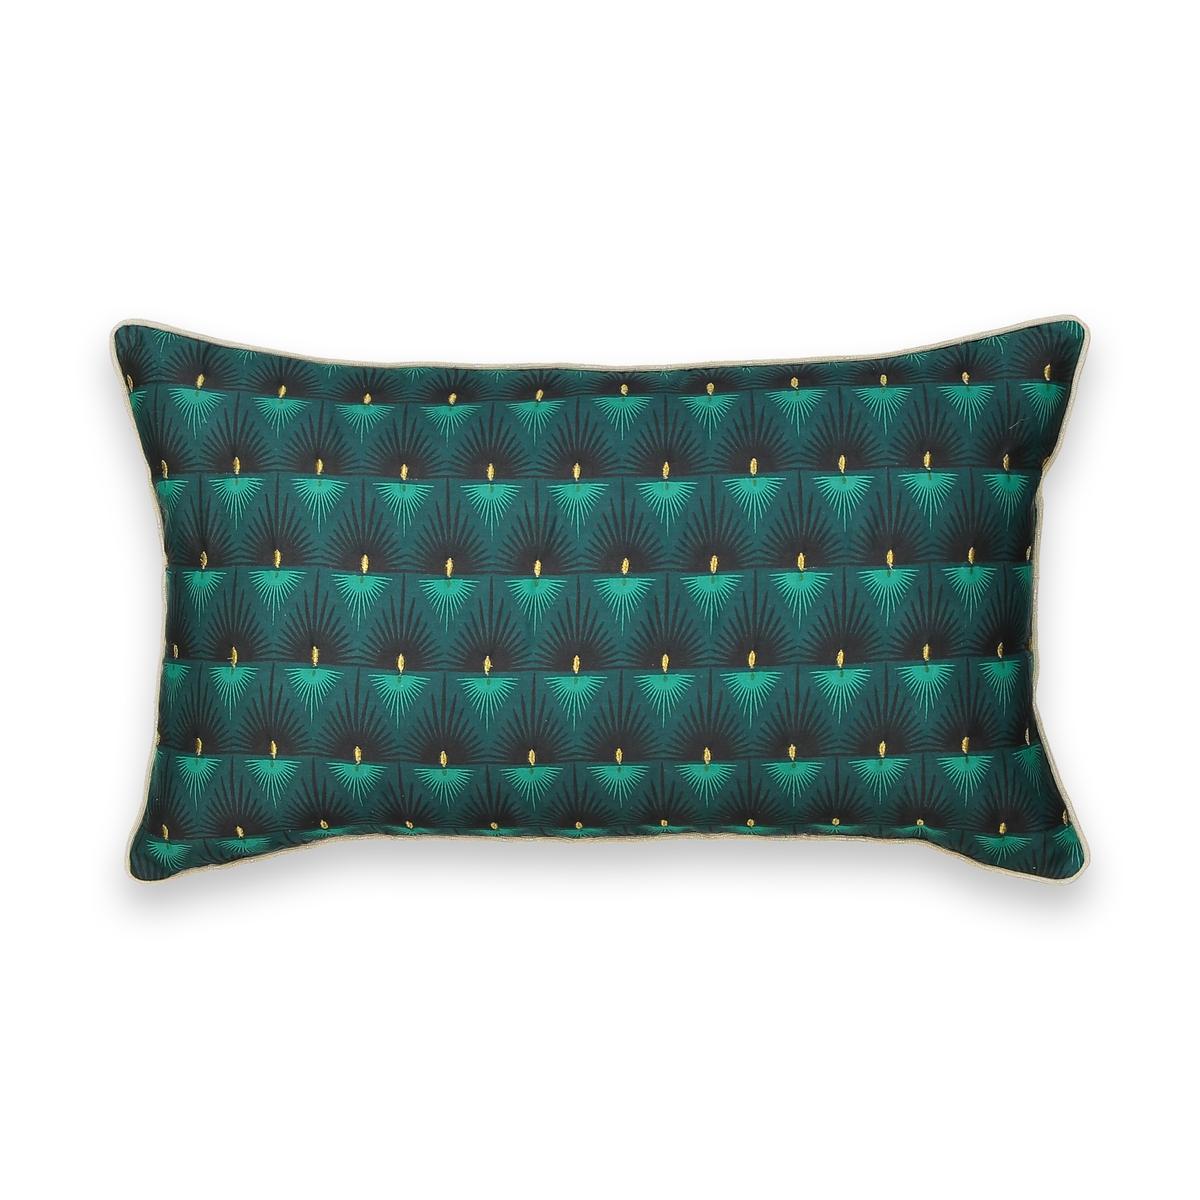 Чехол La Redoute На подушку MACAPA 50 x 30 см зеленый наволочка la redoute flooch 50 x 30 см бежевый